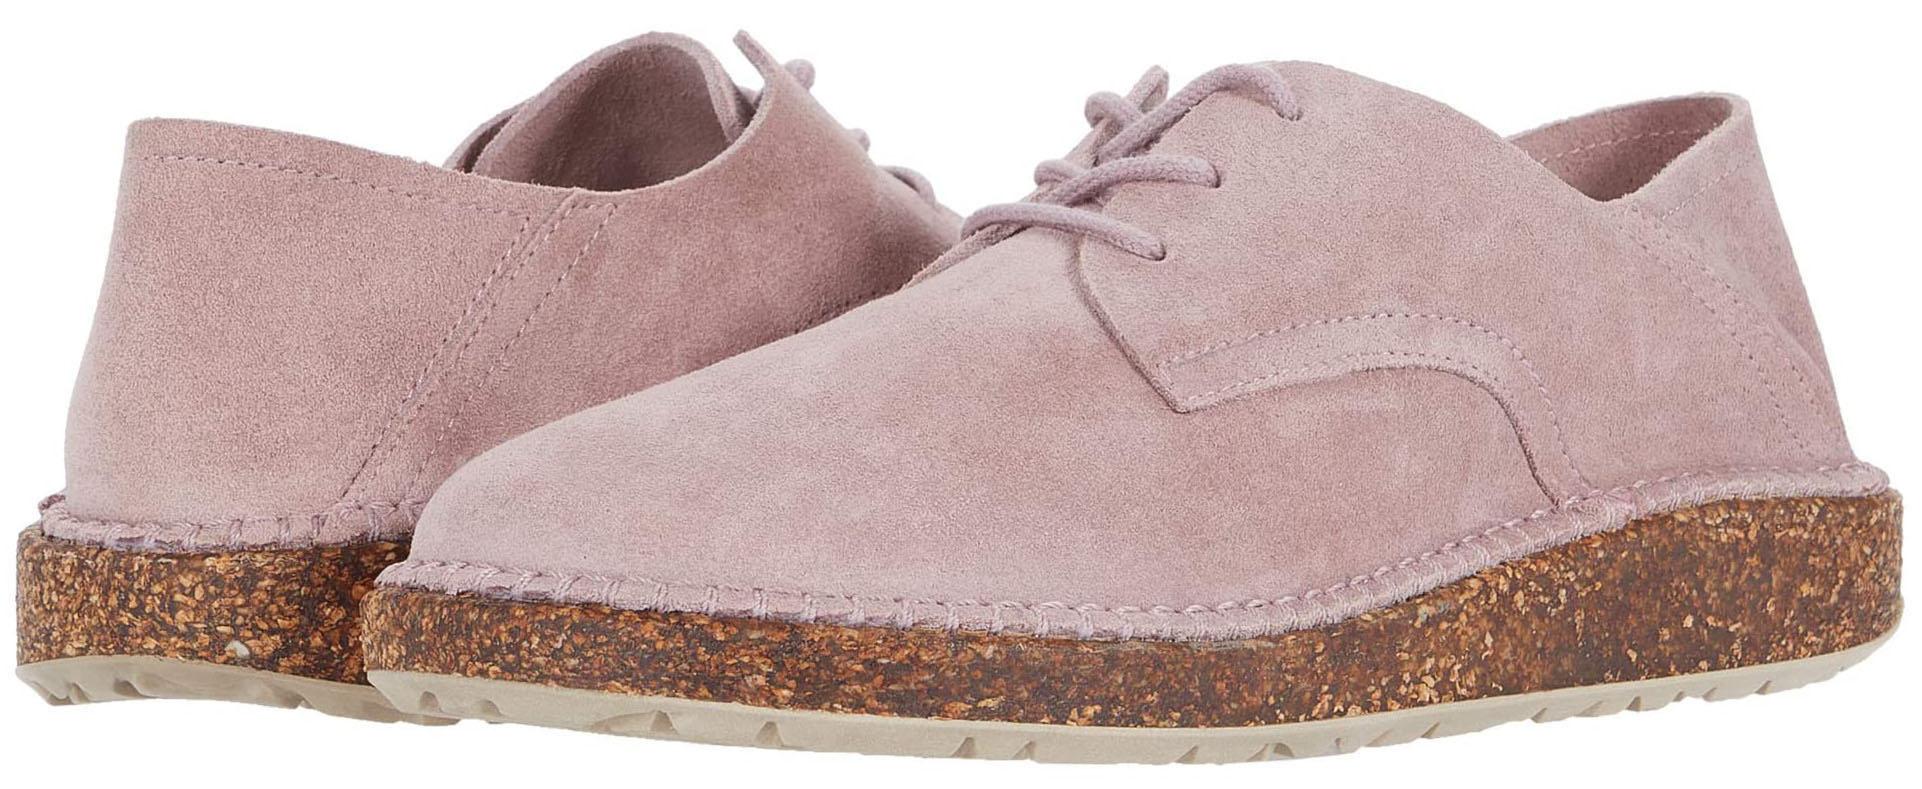 Unique, stylish and comfortable oxfords featuring Birkenstock's signature cork soles